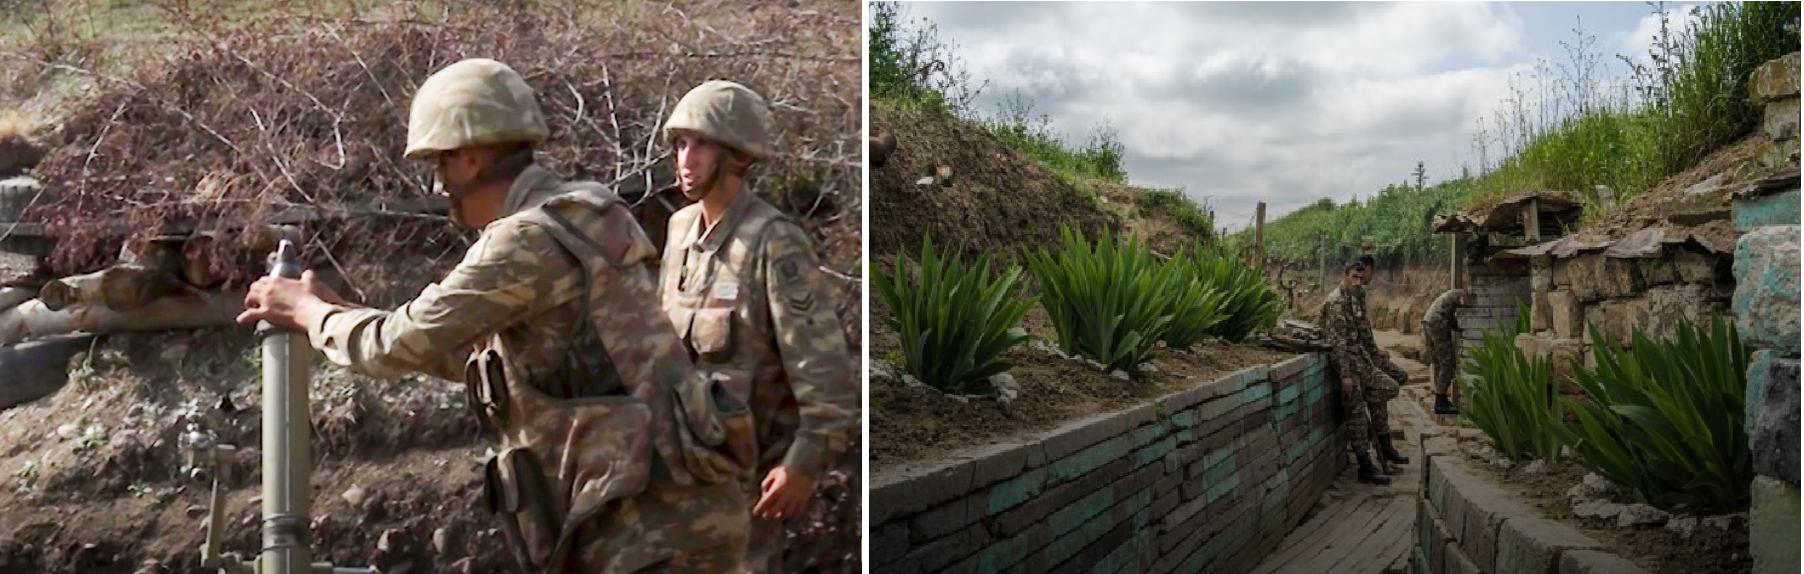 armenia azerbaijan clashes behind the fighting in nagorno karabakh